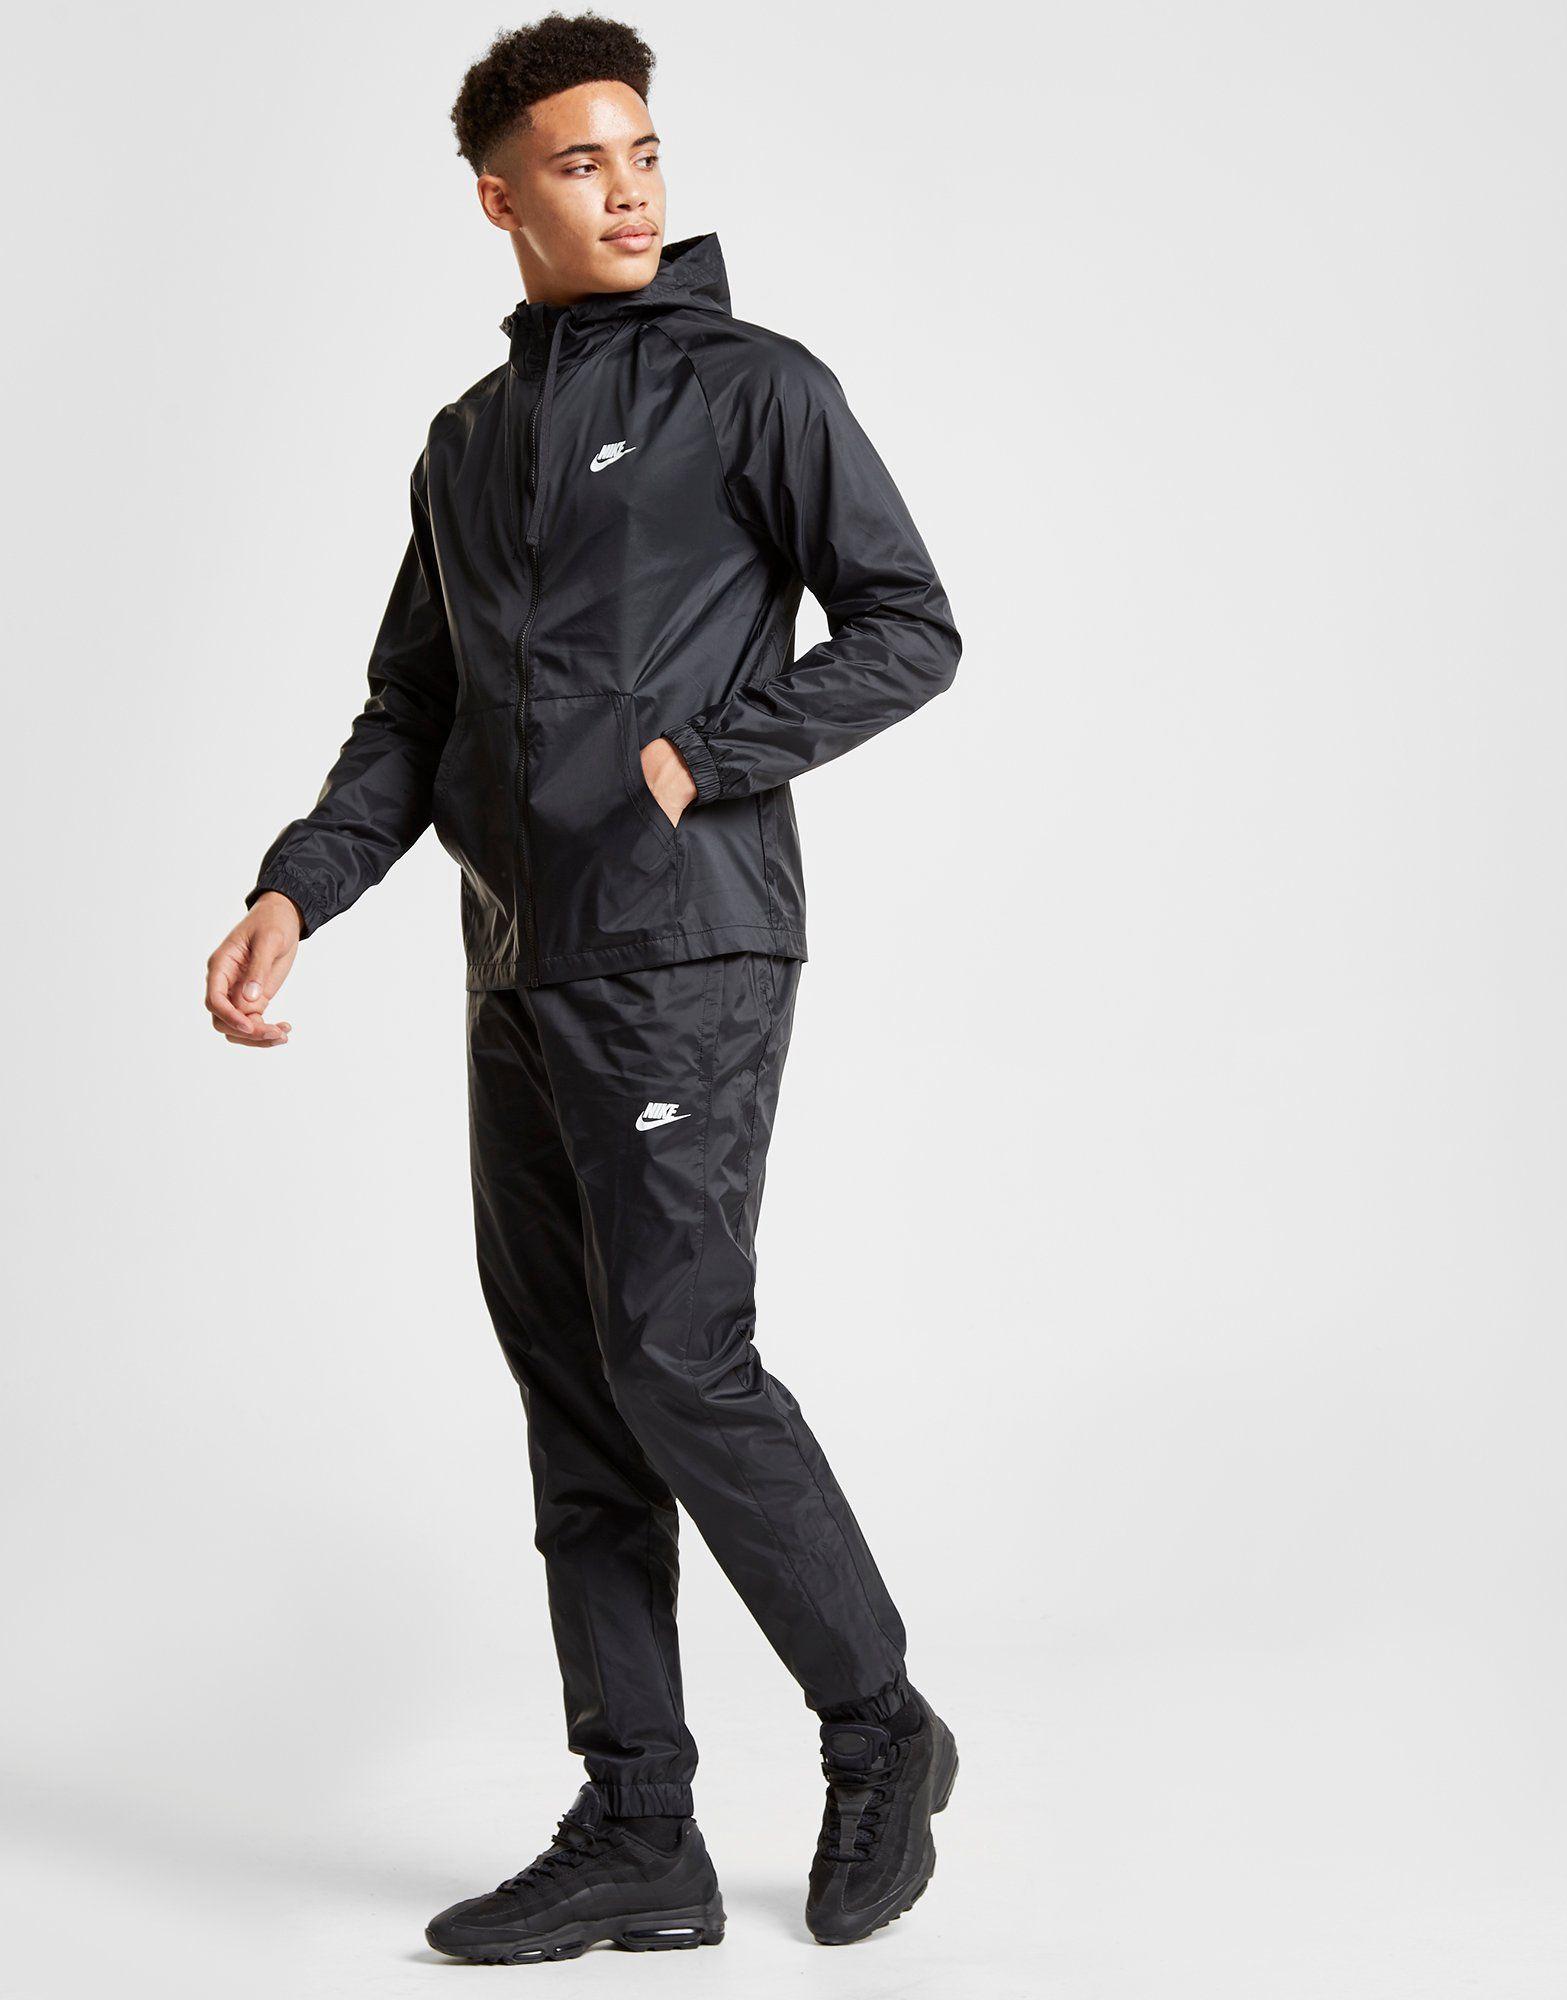 Nike Shut Out Hooded Jacket